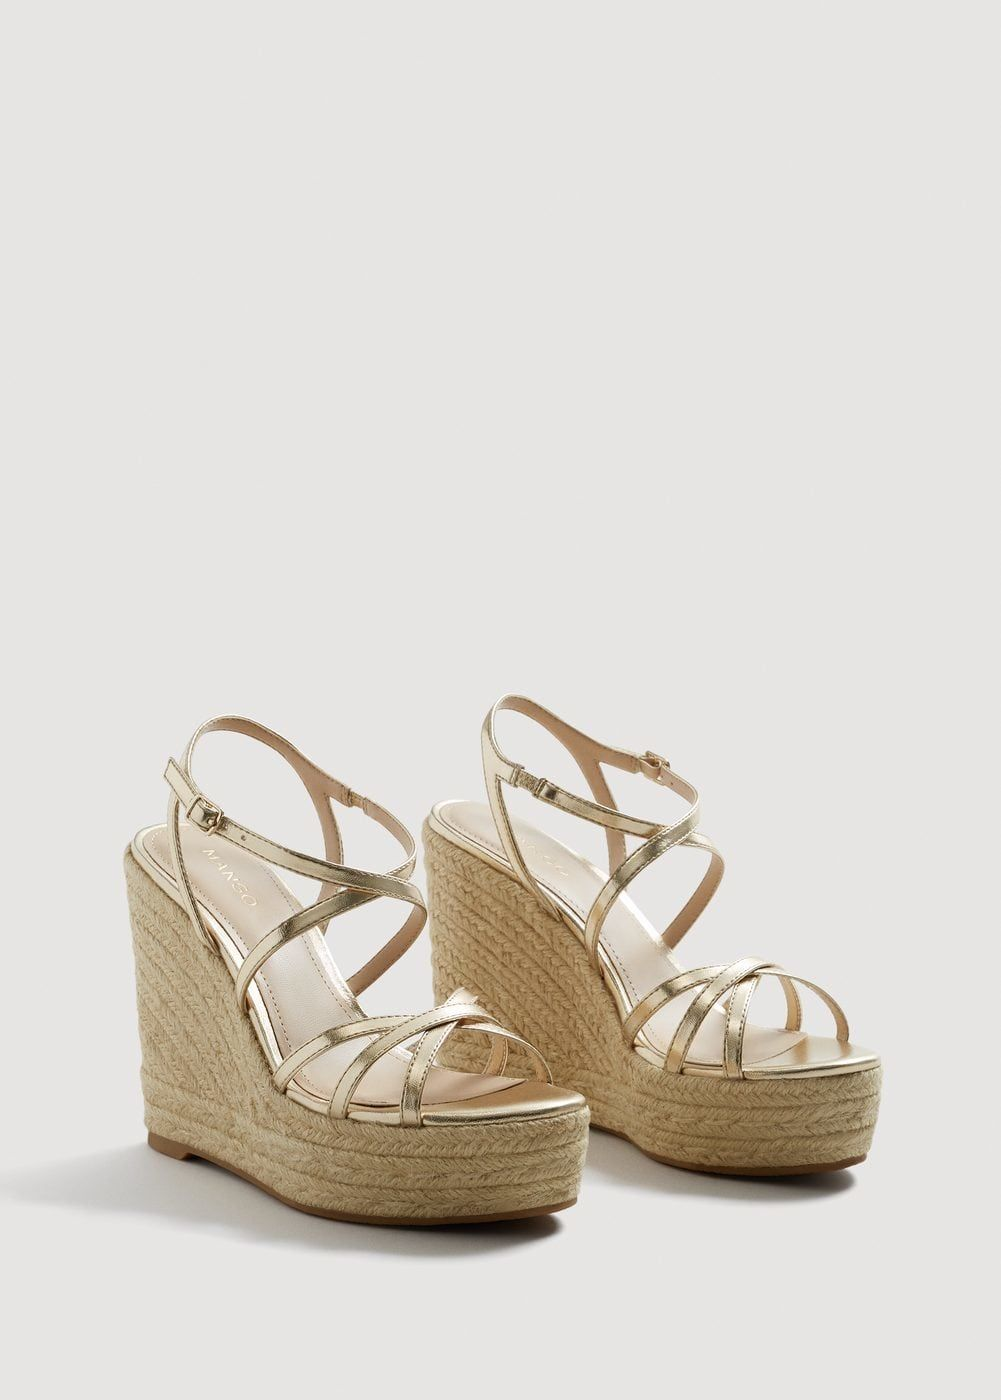 8979ca82d8 Sandalia cruzada cuña - Zapatos de Mujer | Best - essentials ...